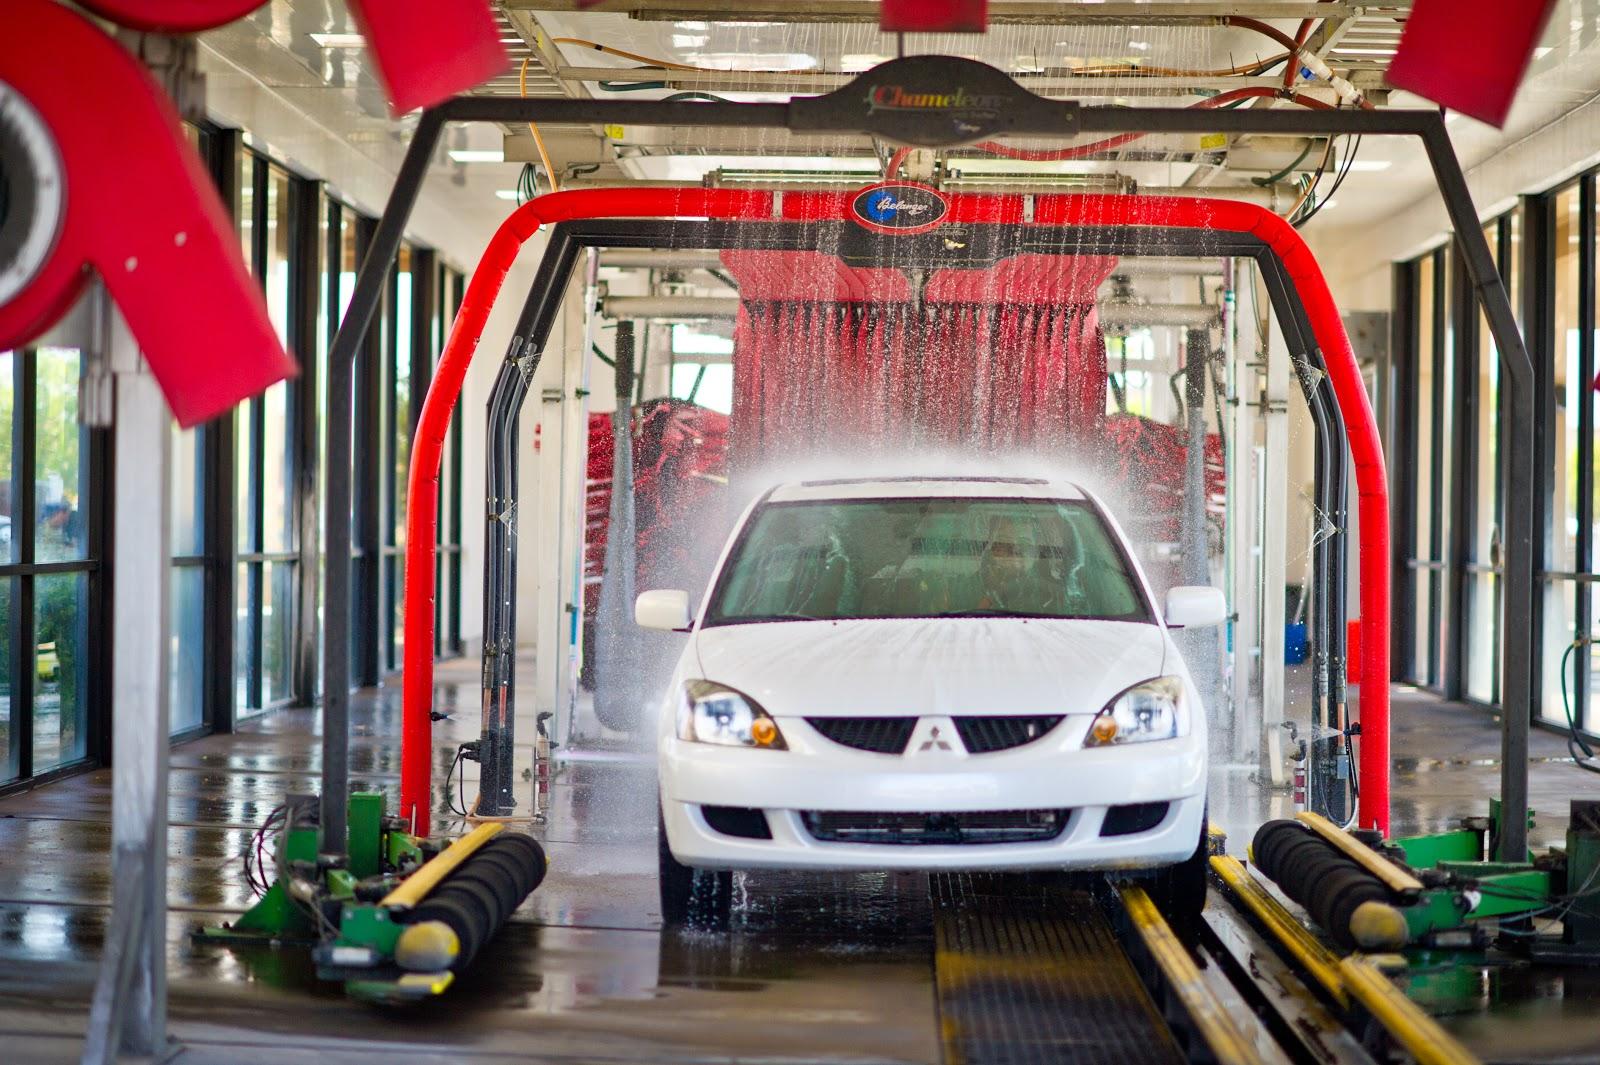 Car Wash Supplies Wholesale